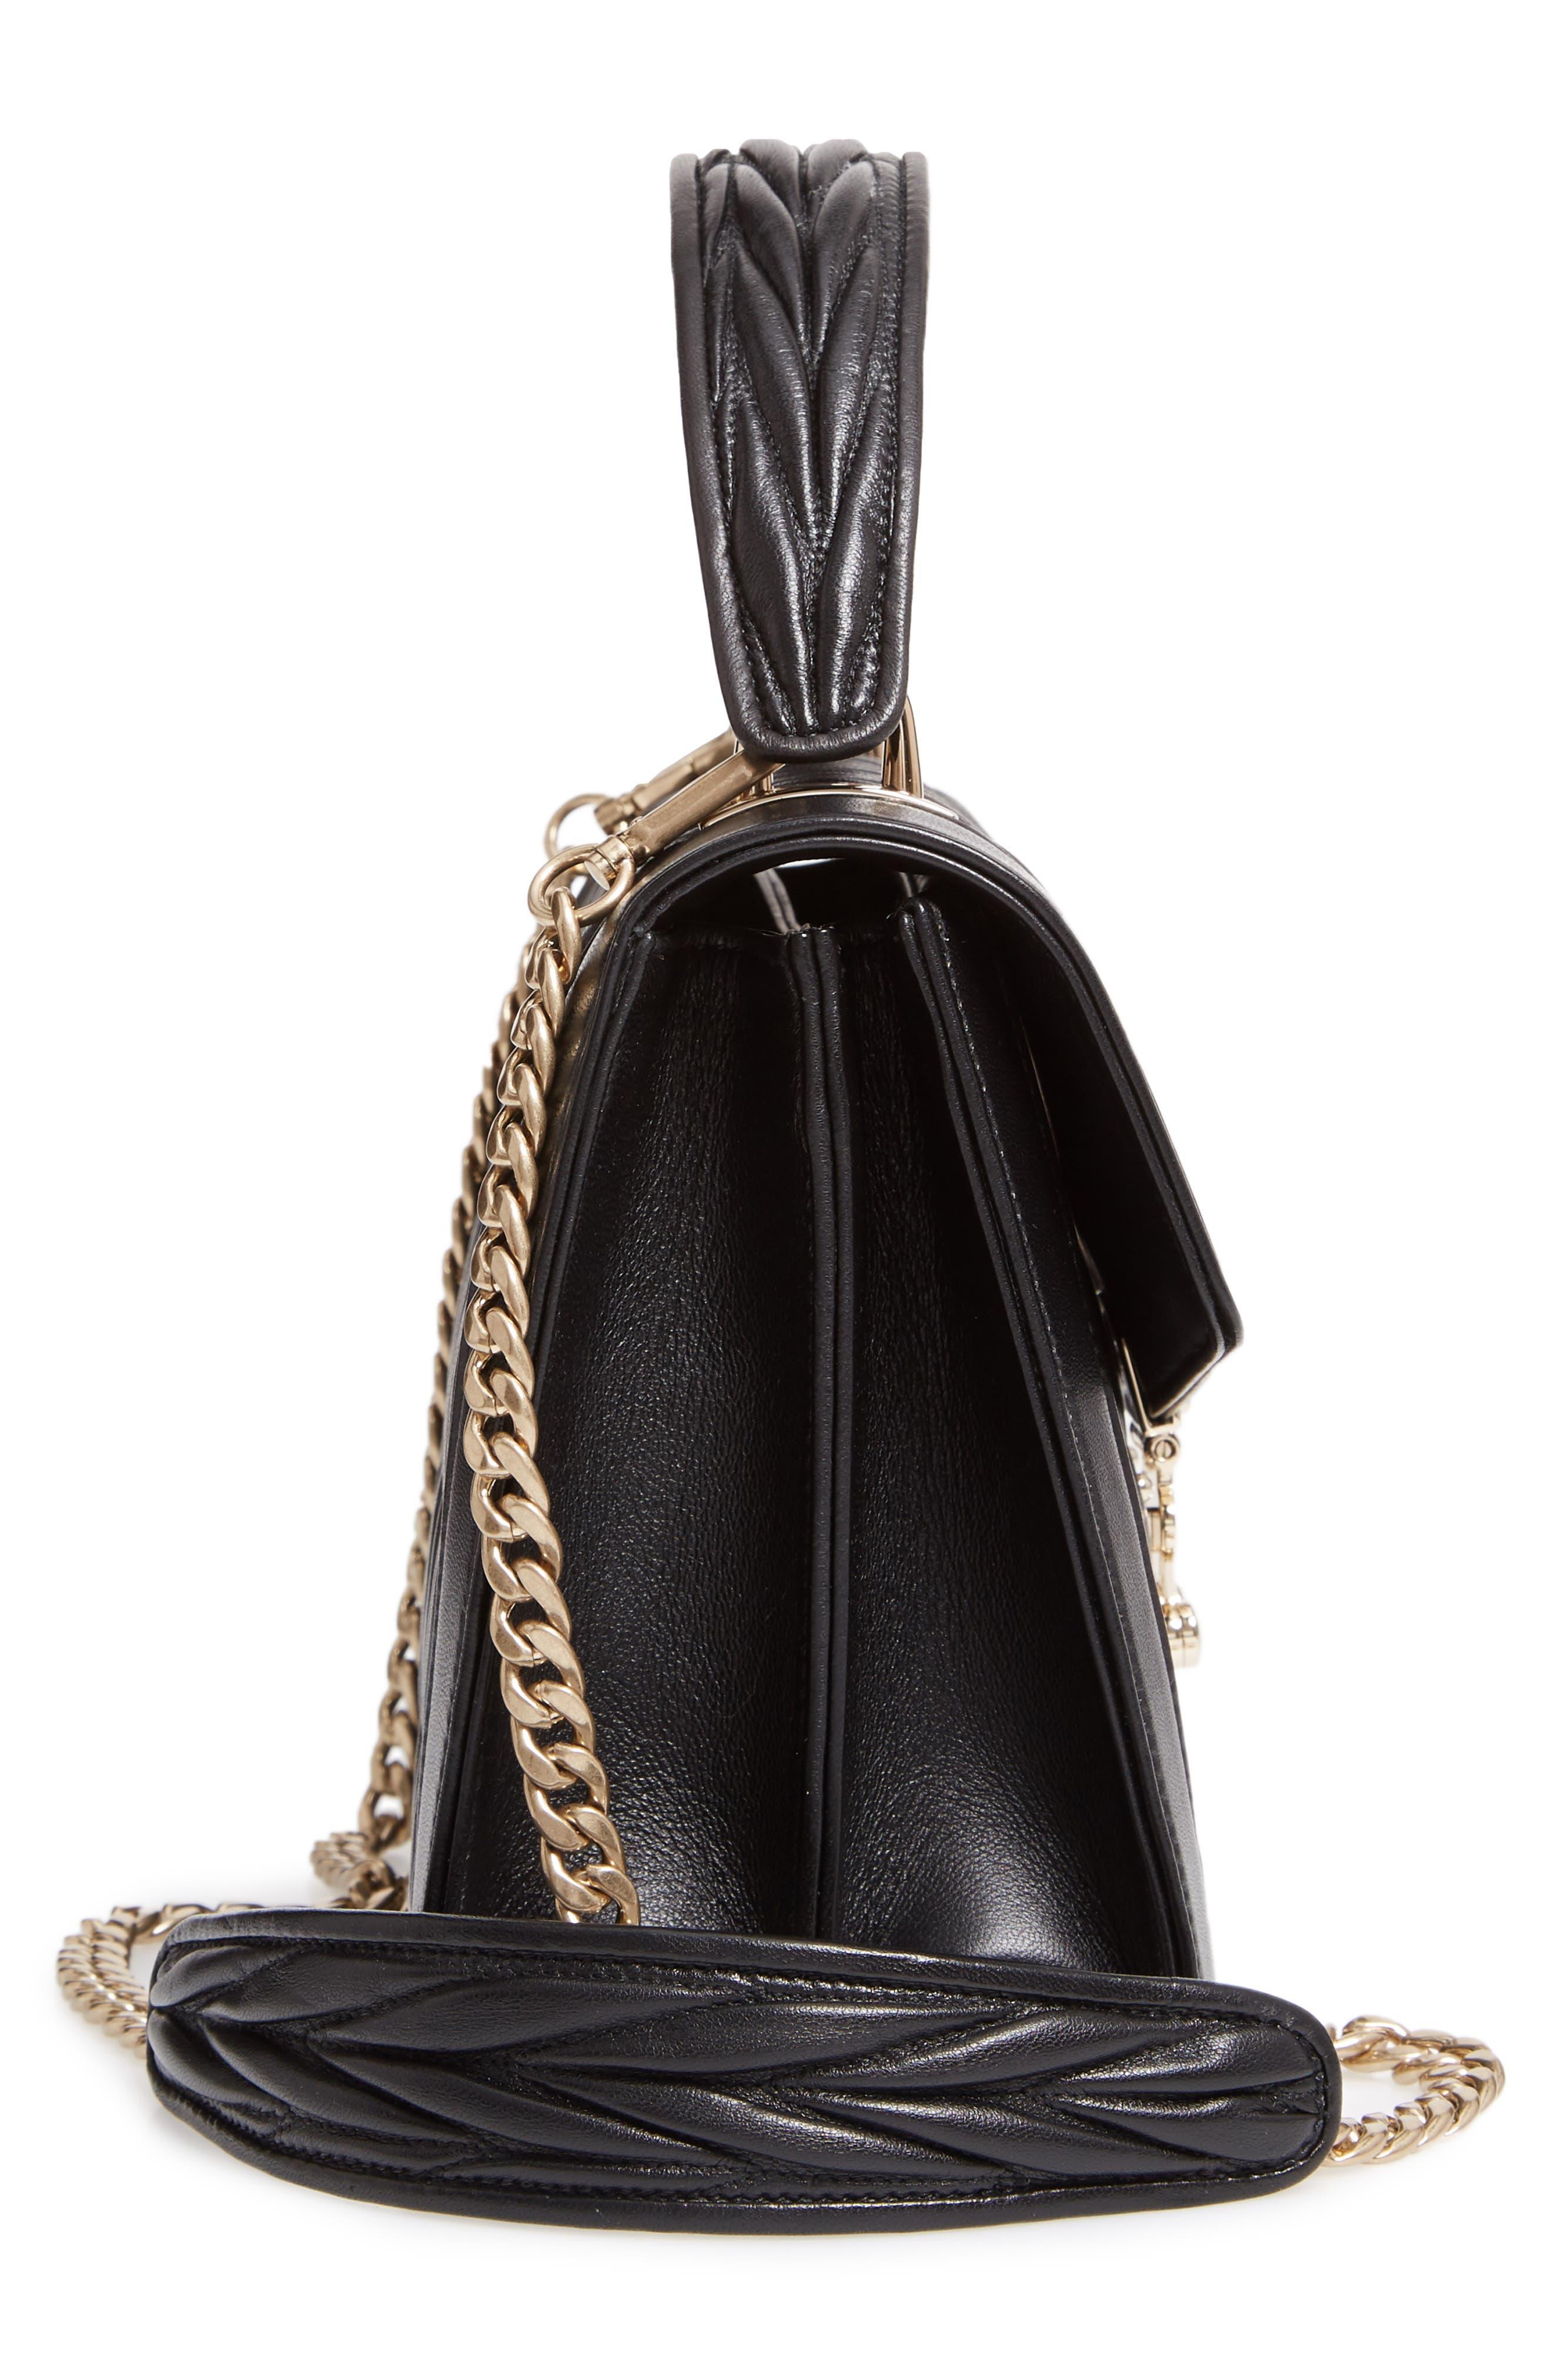 Confidential Matelassé Quilted Lambskin Leather Top Handle Bag,                             Alternate thumbnail 5, color,                             NERO